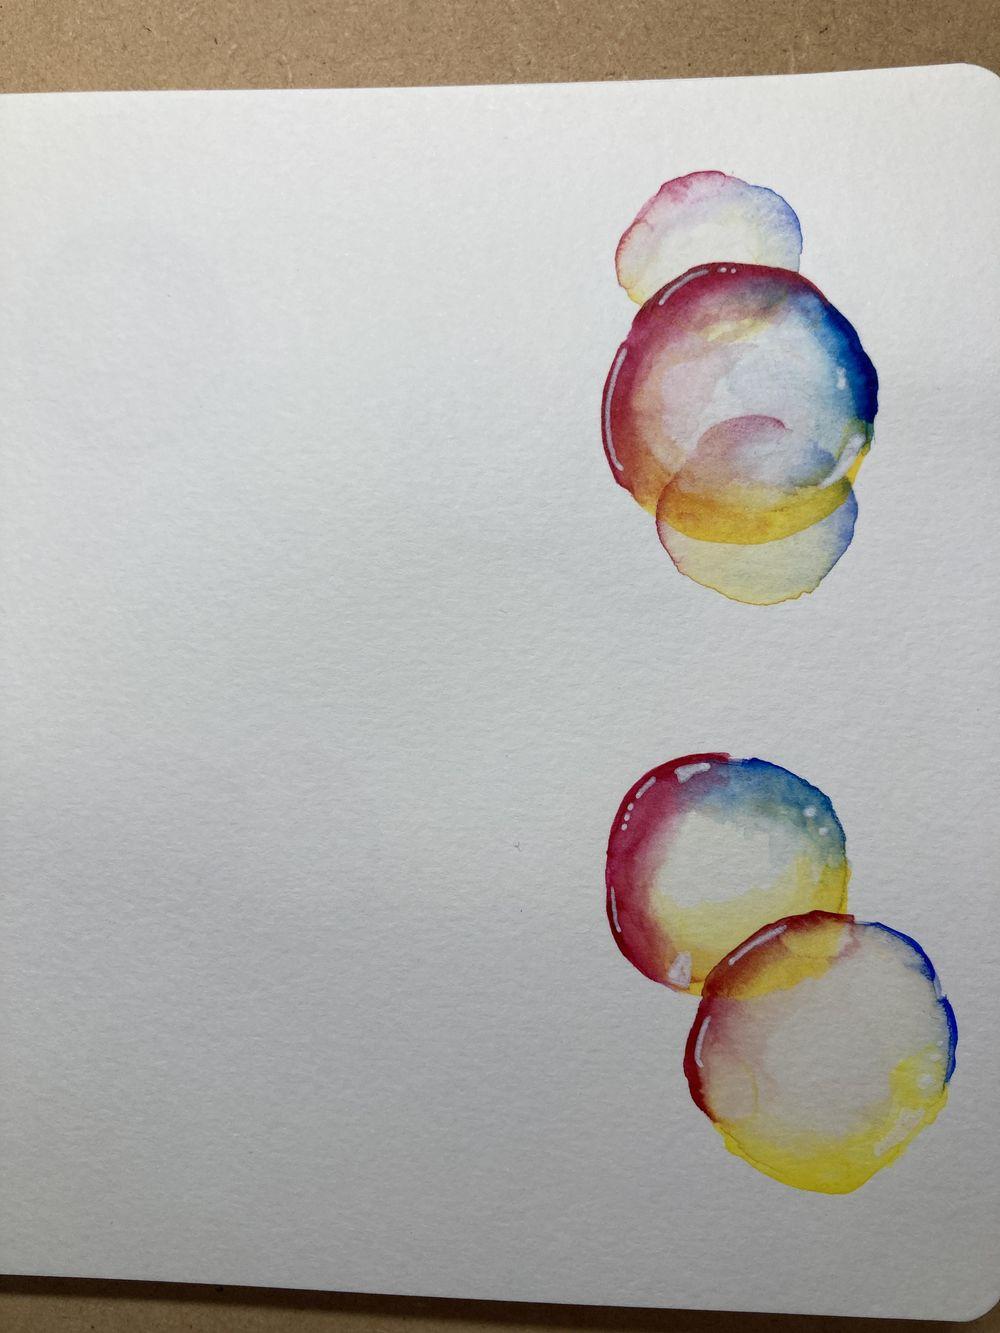 Bubbles! - image 3 - student project